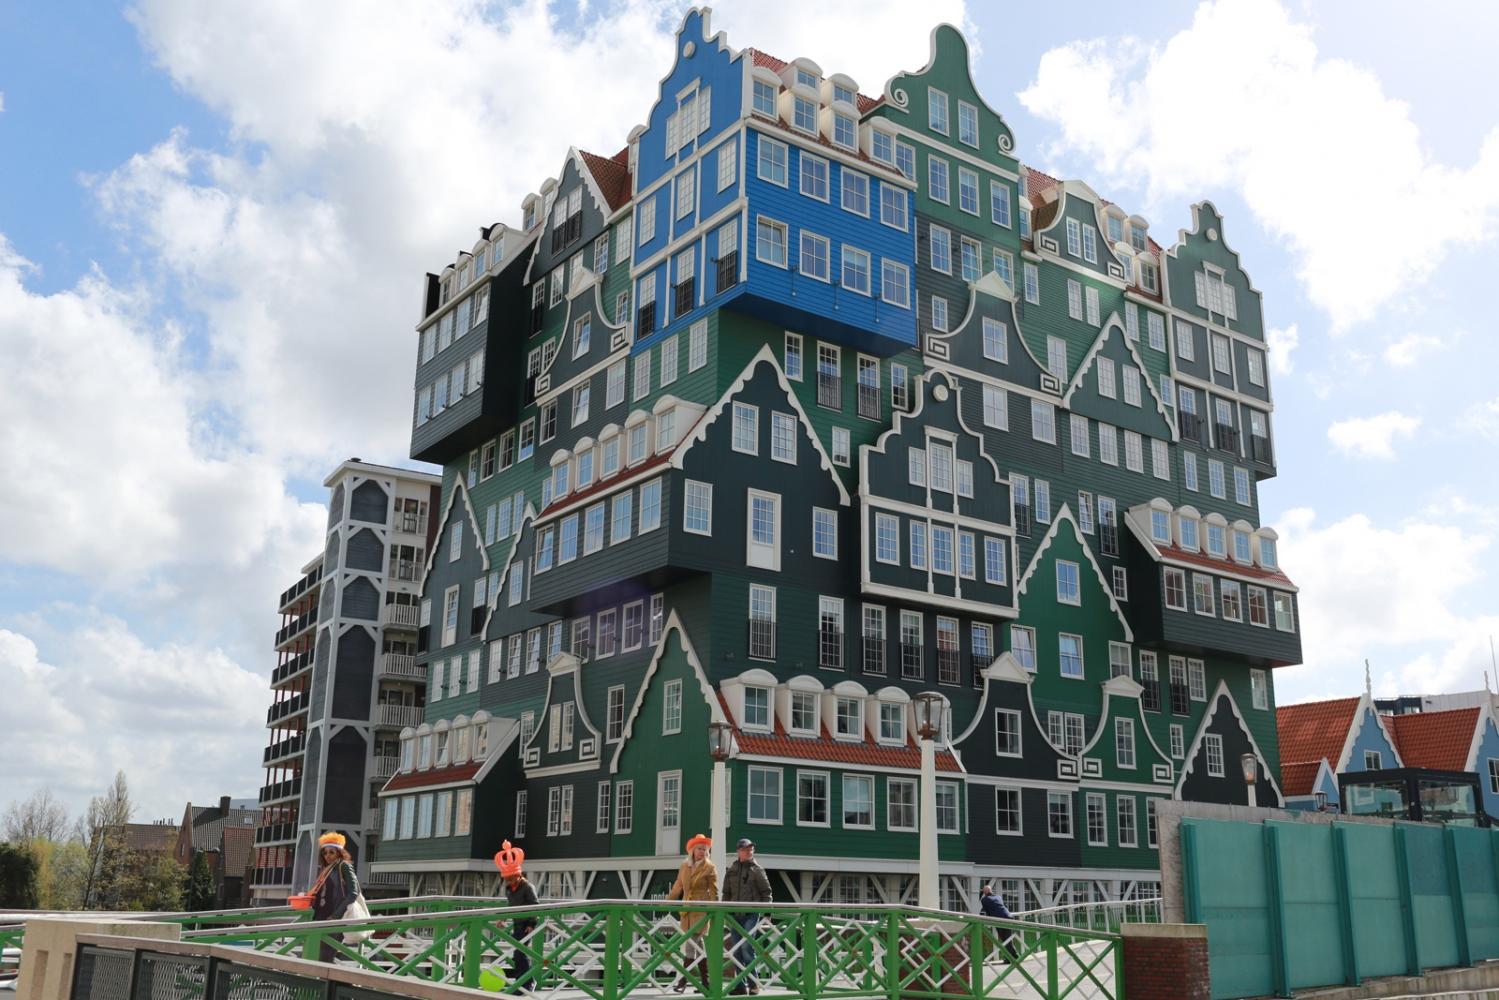 Zaandam was a leading city in the firstIndustrial Revolution.